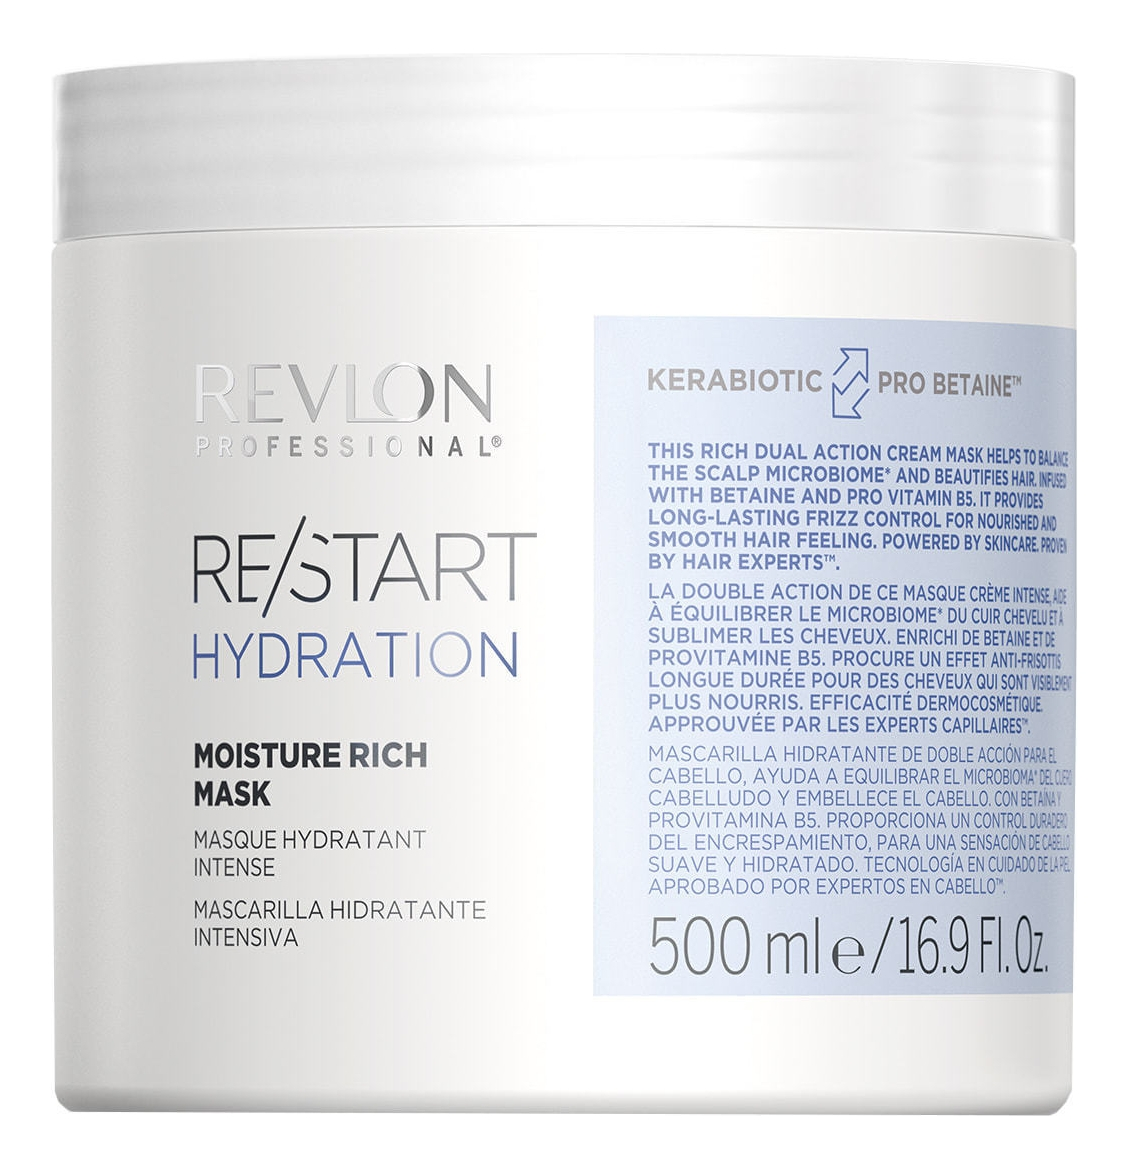 Фото - REVLON Маска Restart Hydration Moisture Rich Mask Интенсивно Увлажняющая, 500 мл medius двойная маска увлажняющая moisture focus 25 мл